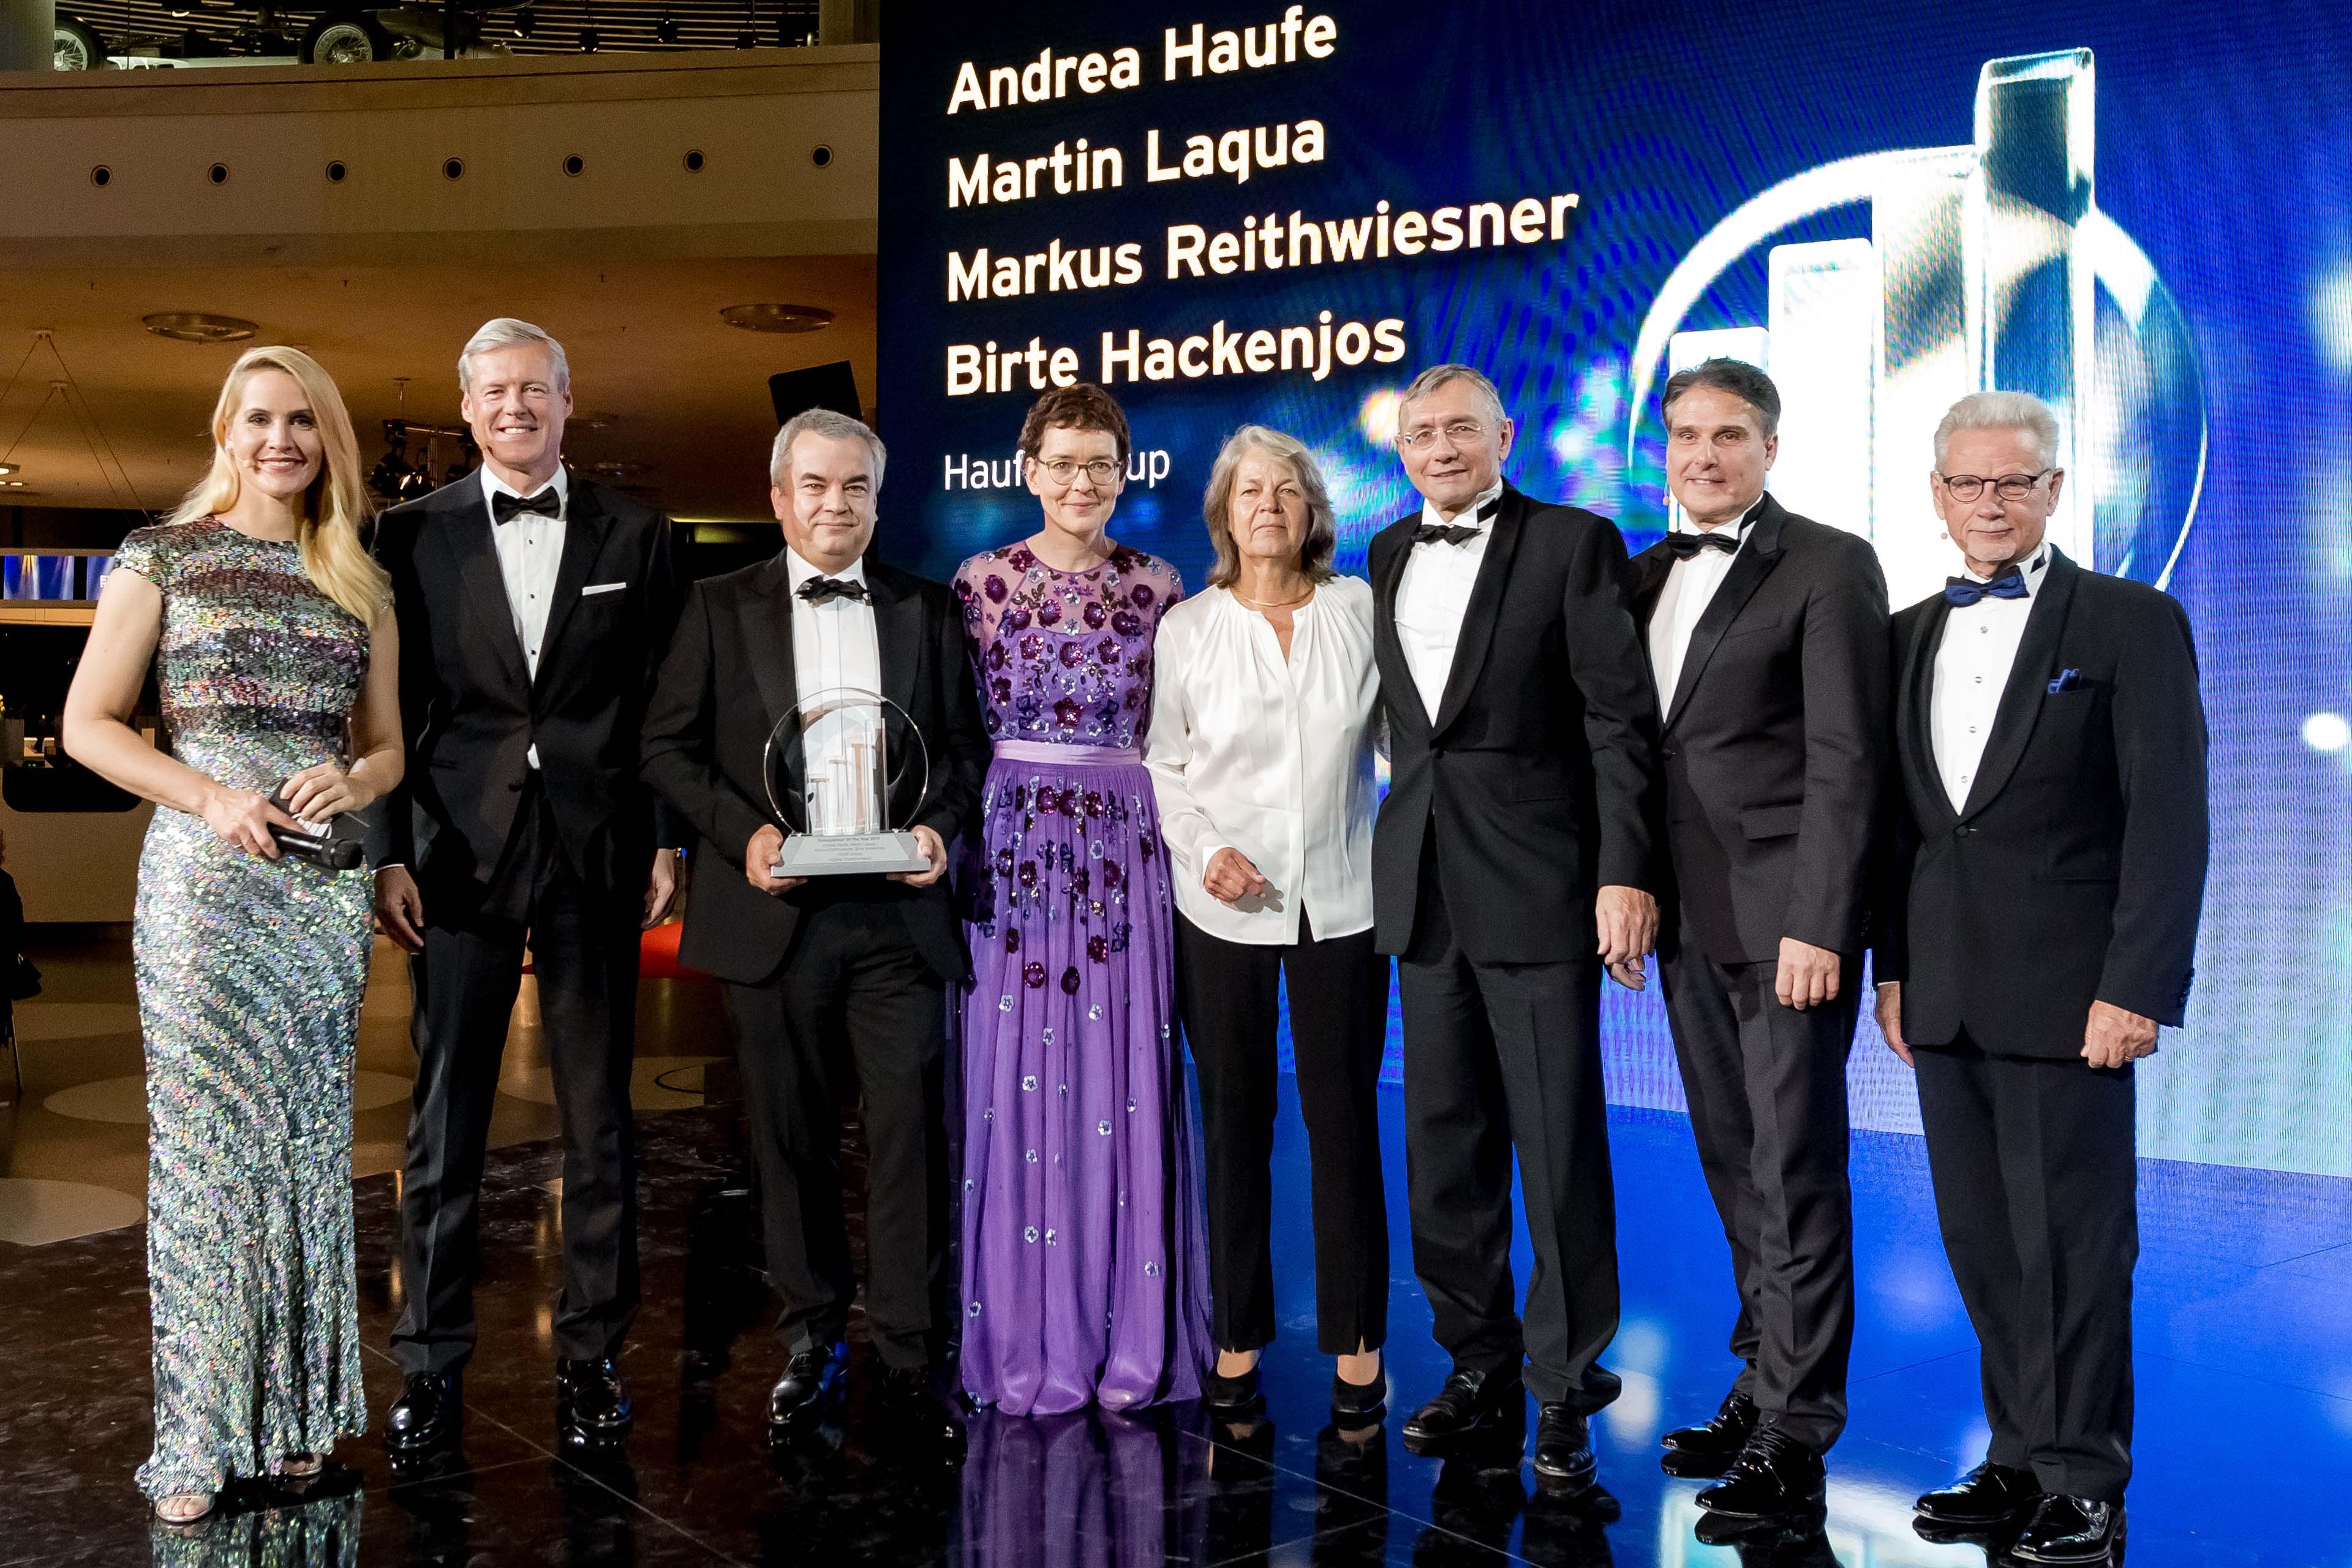 Judith Rakers, Hartmut Jenner, Markus Reithwiesner, Birte Hackenjos, Andrea Haufe, Martin Laqua, Michael Marbler, Dr. Manfred Wittenstein